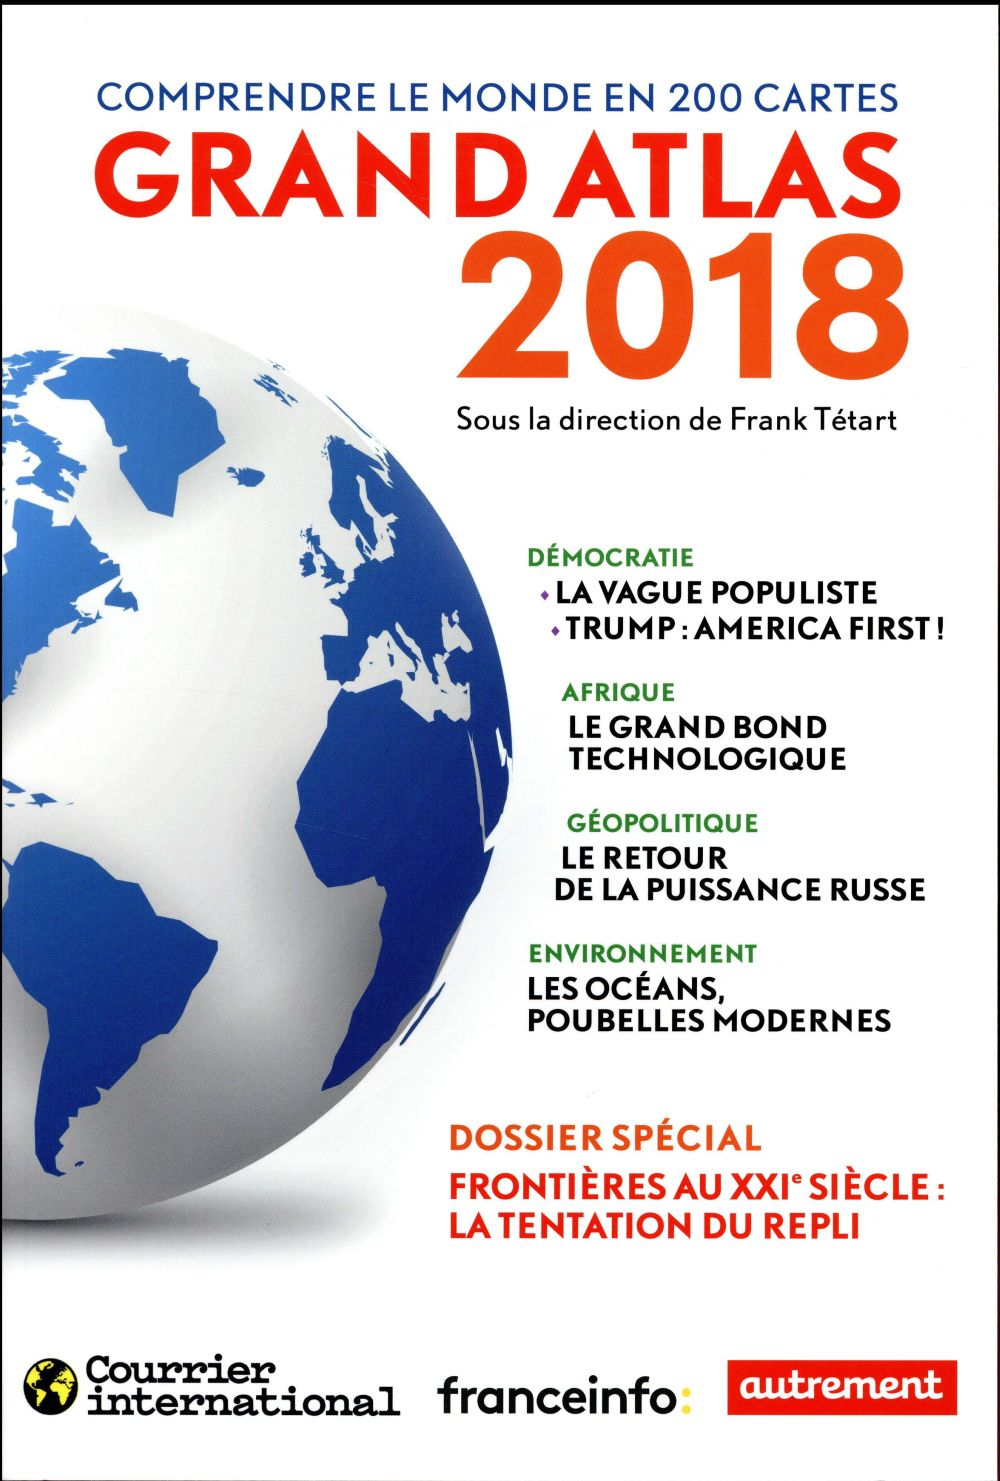 Grand atlas 2018 ; comprendre le monde en 200 cartes